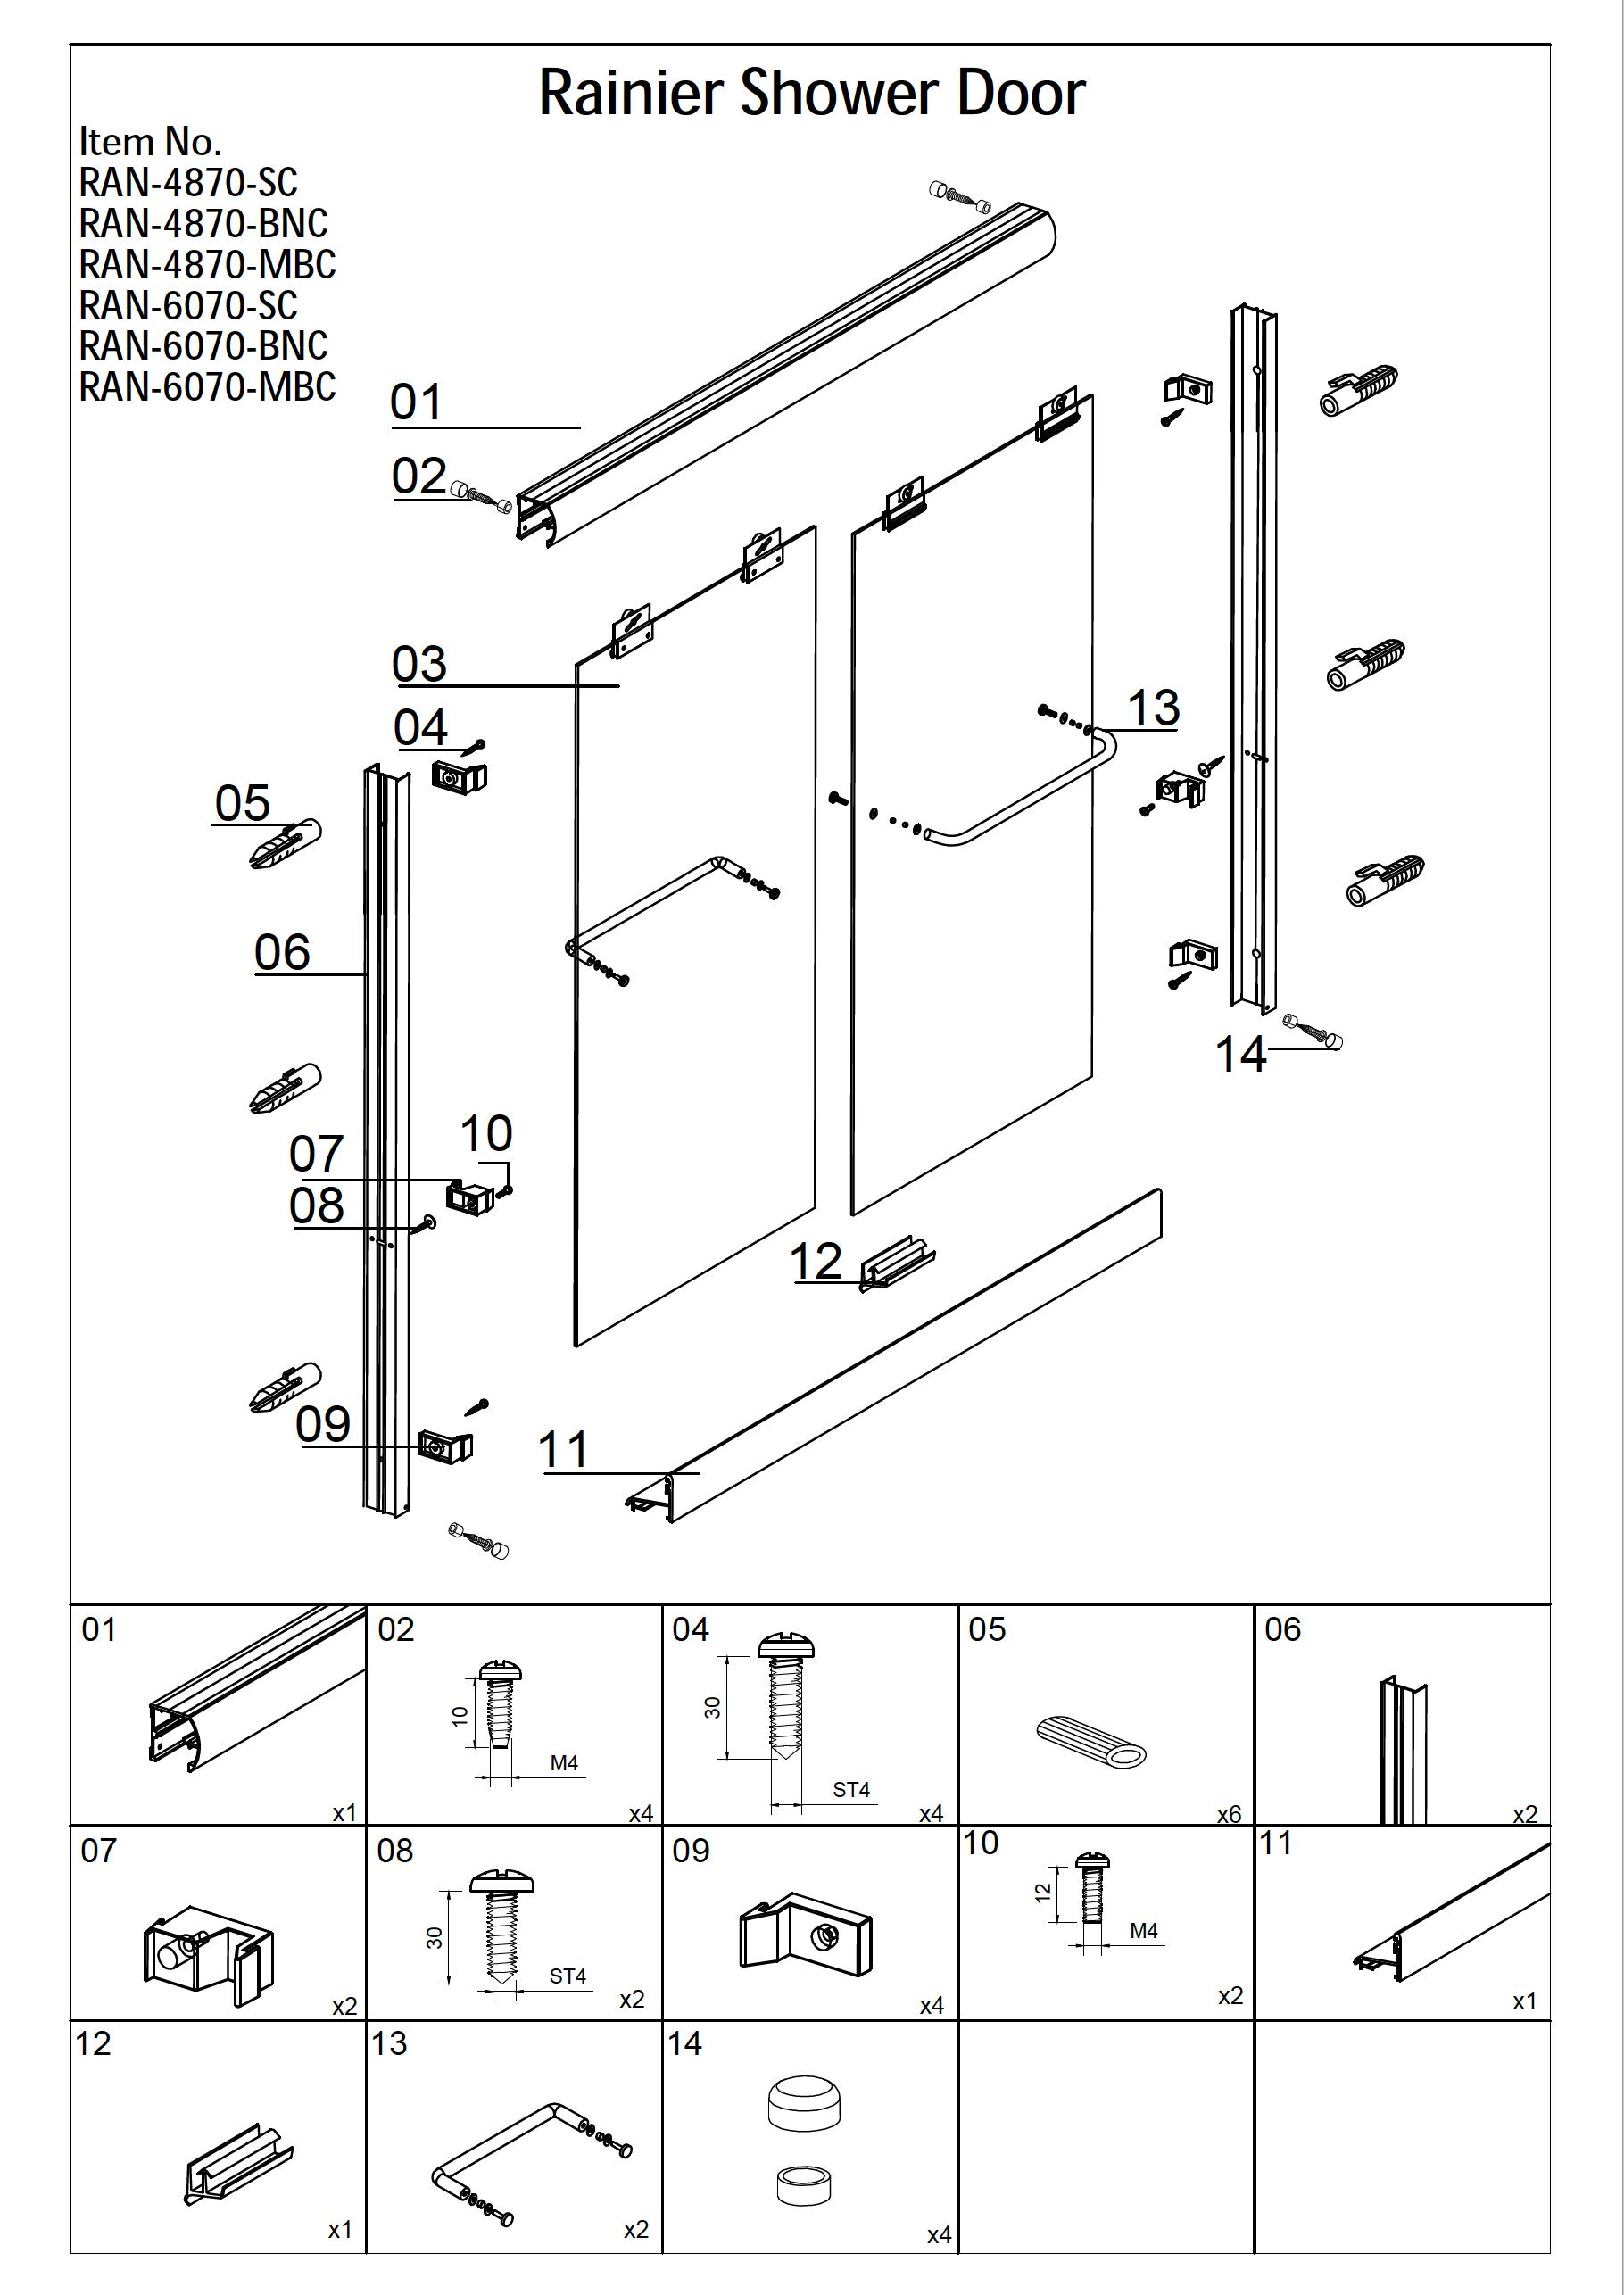 Rainier Shower Door Installation